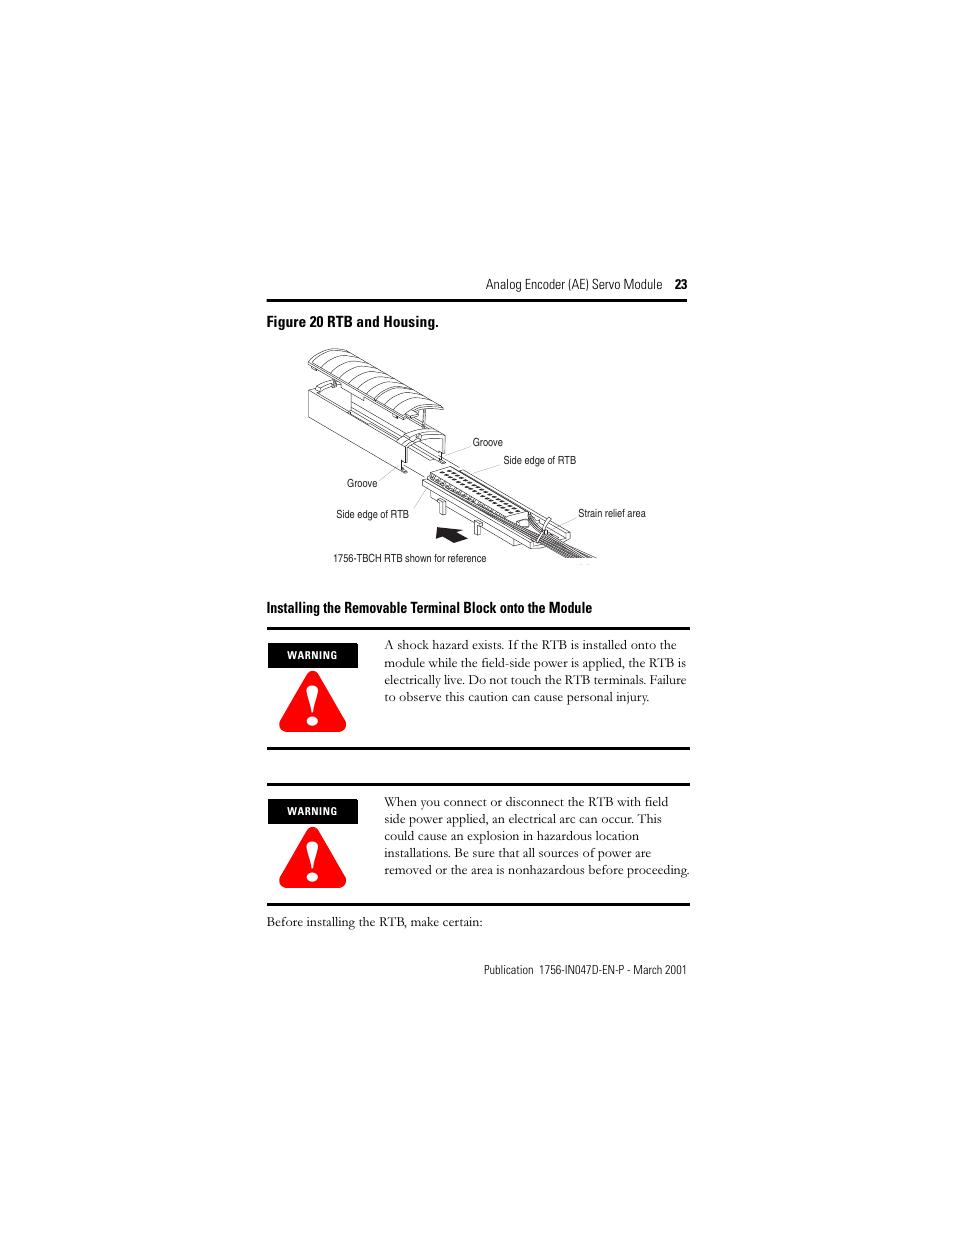 rockwell automation 1756 m02ae analog encoder ae servo module rh manualsdir com 1756-m02ae user manual